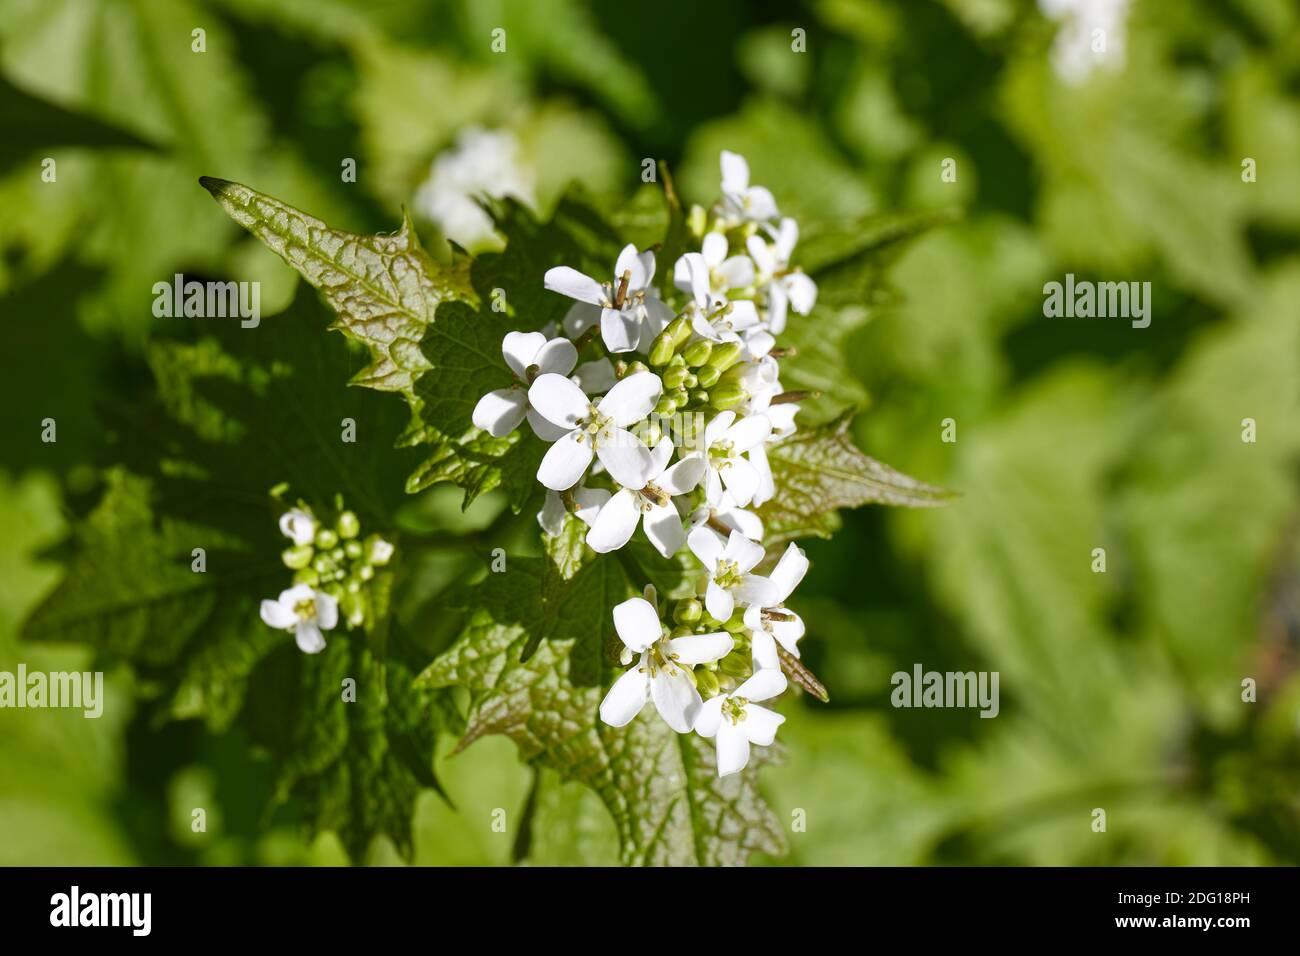 Alliaria petiolata, garlic mustard, with flowers Stock Photo